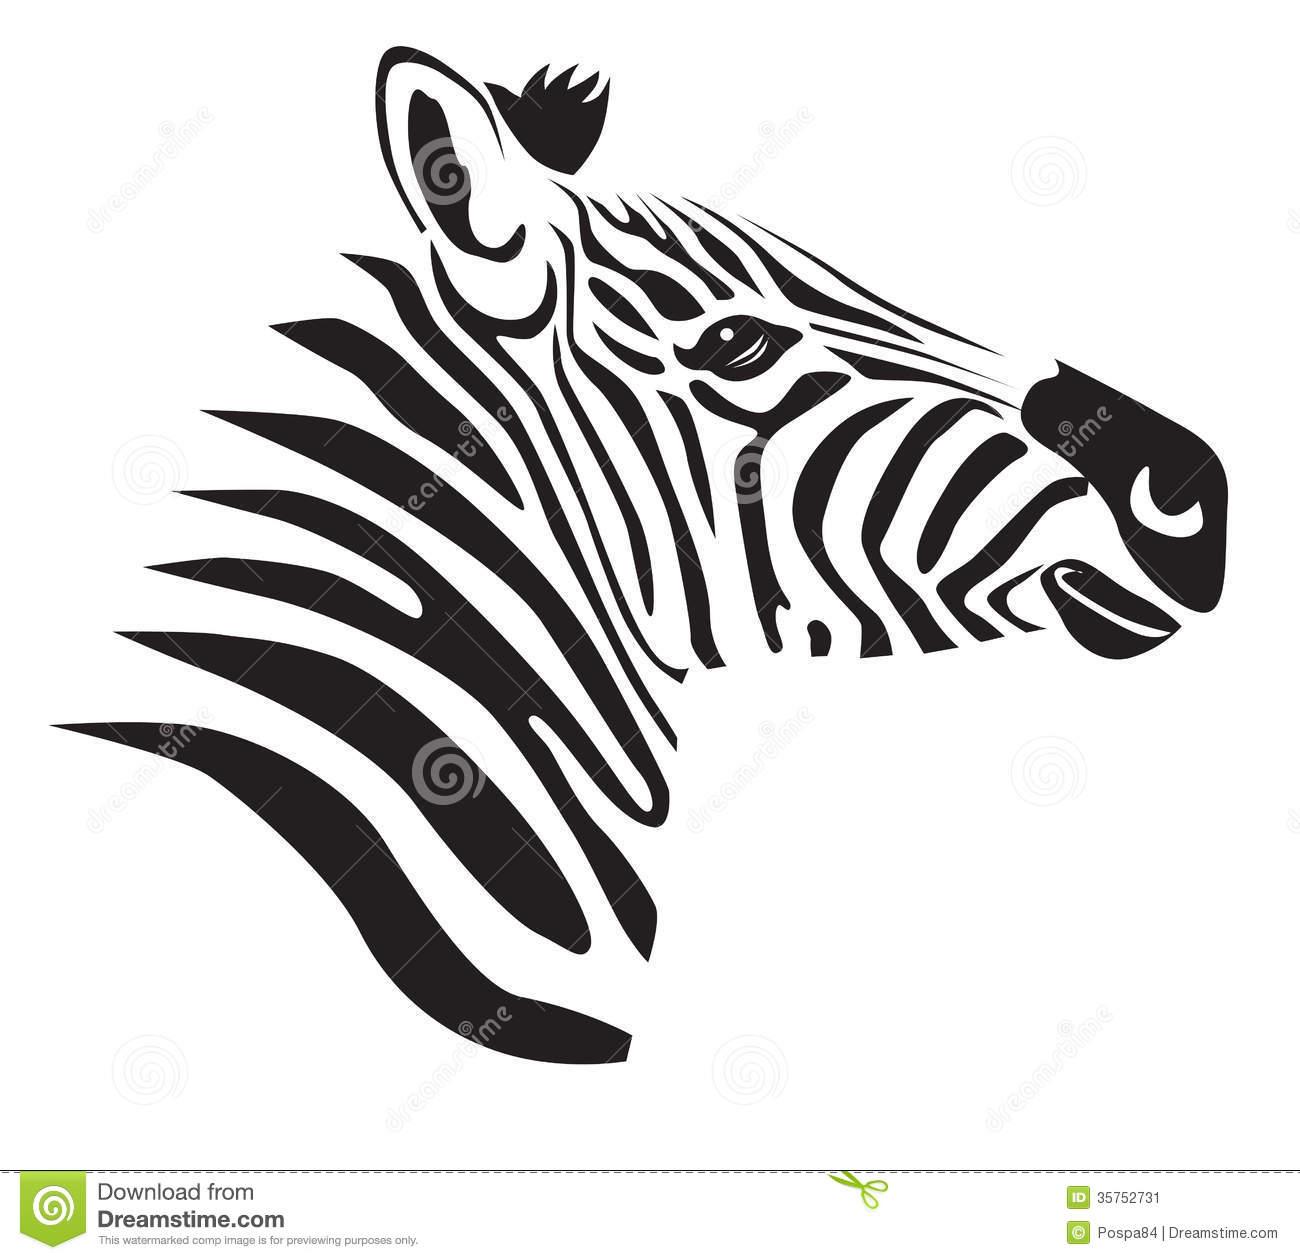 clipart zebra images - photo #42